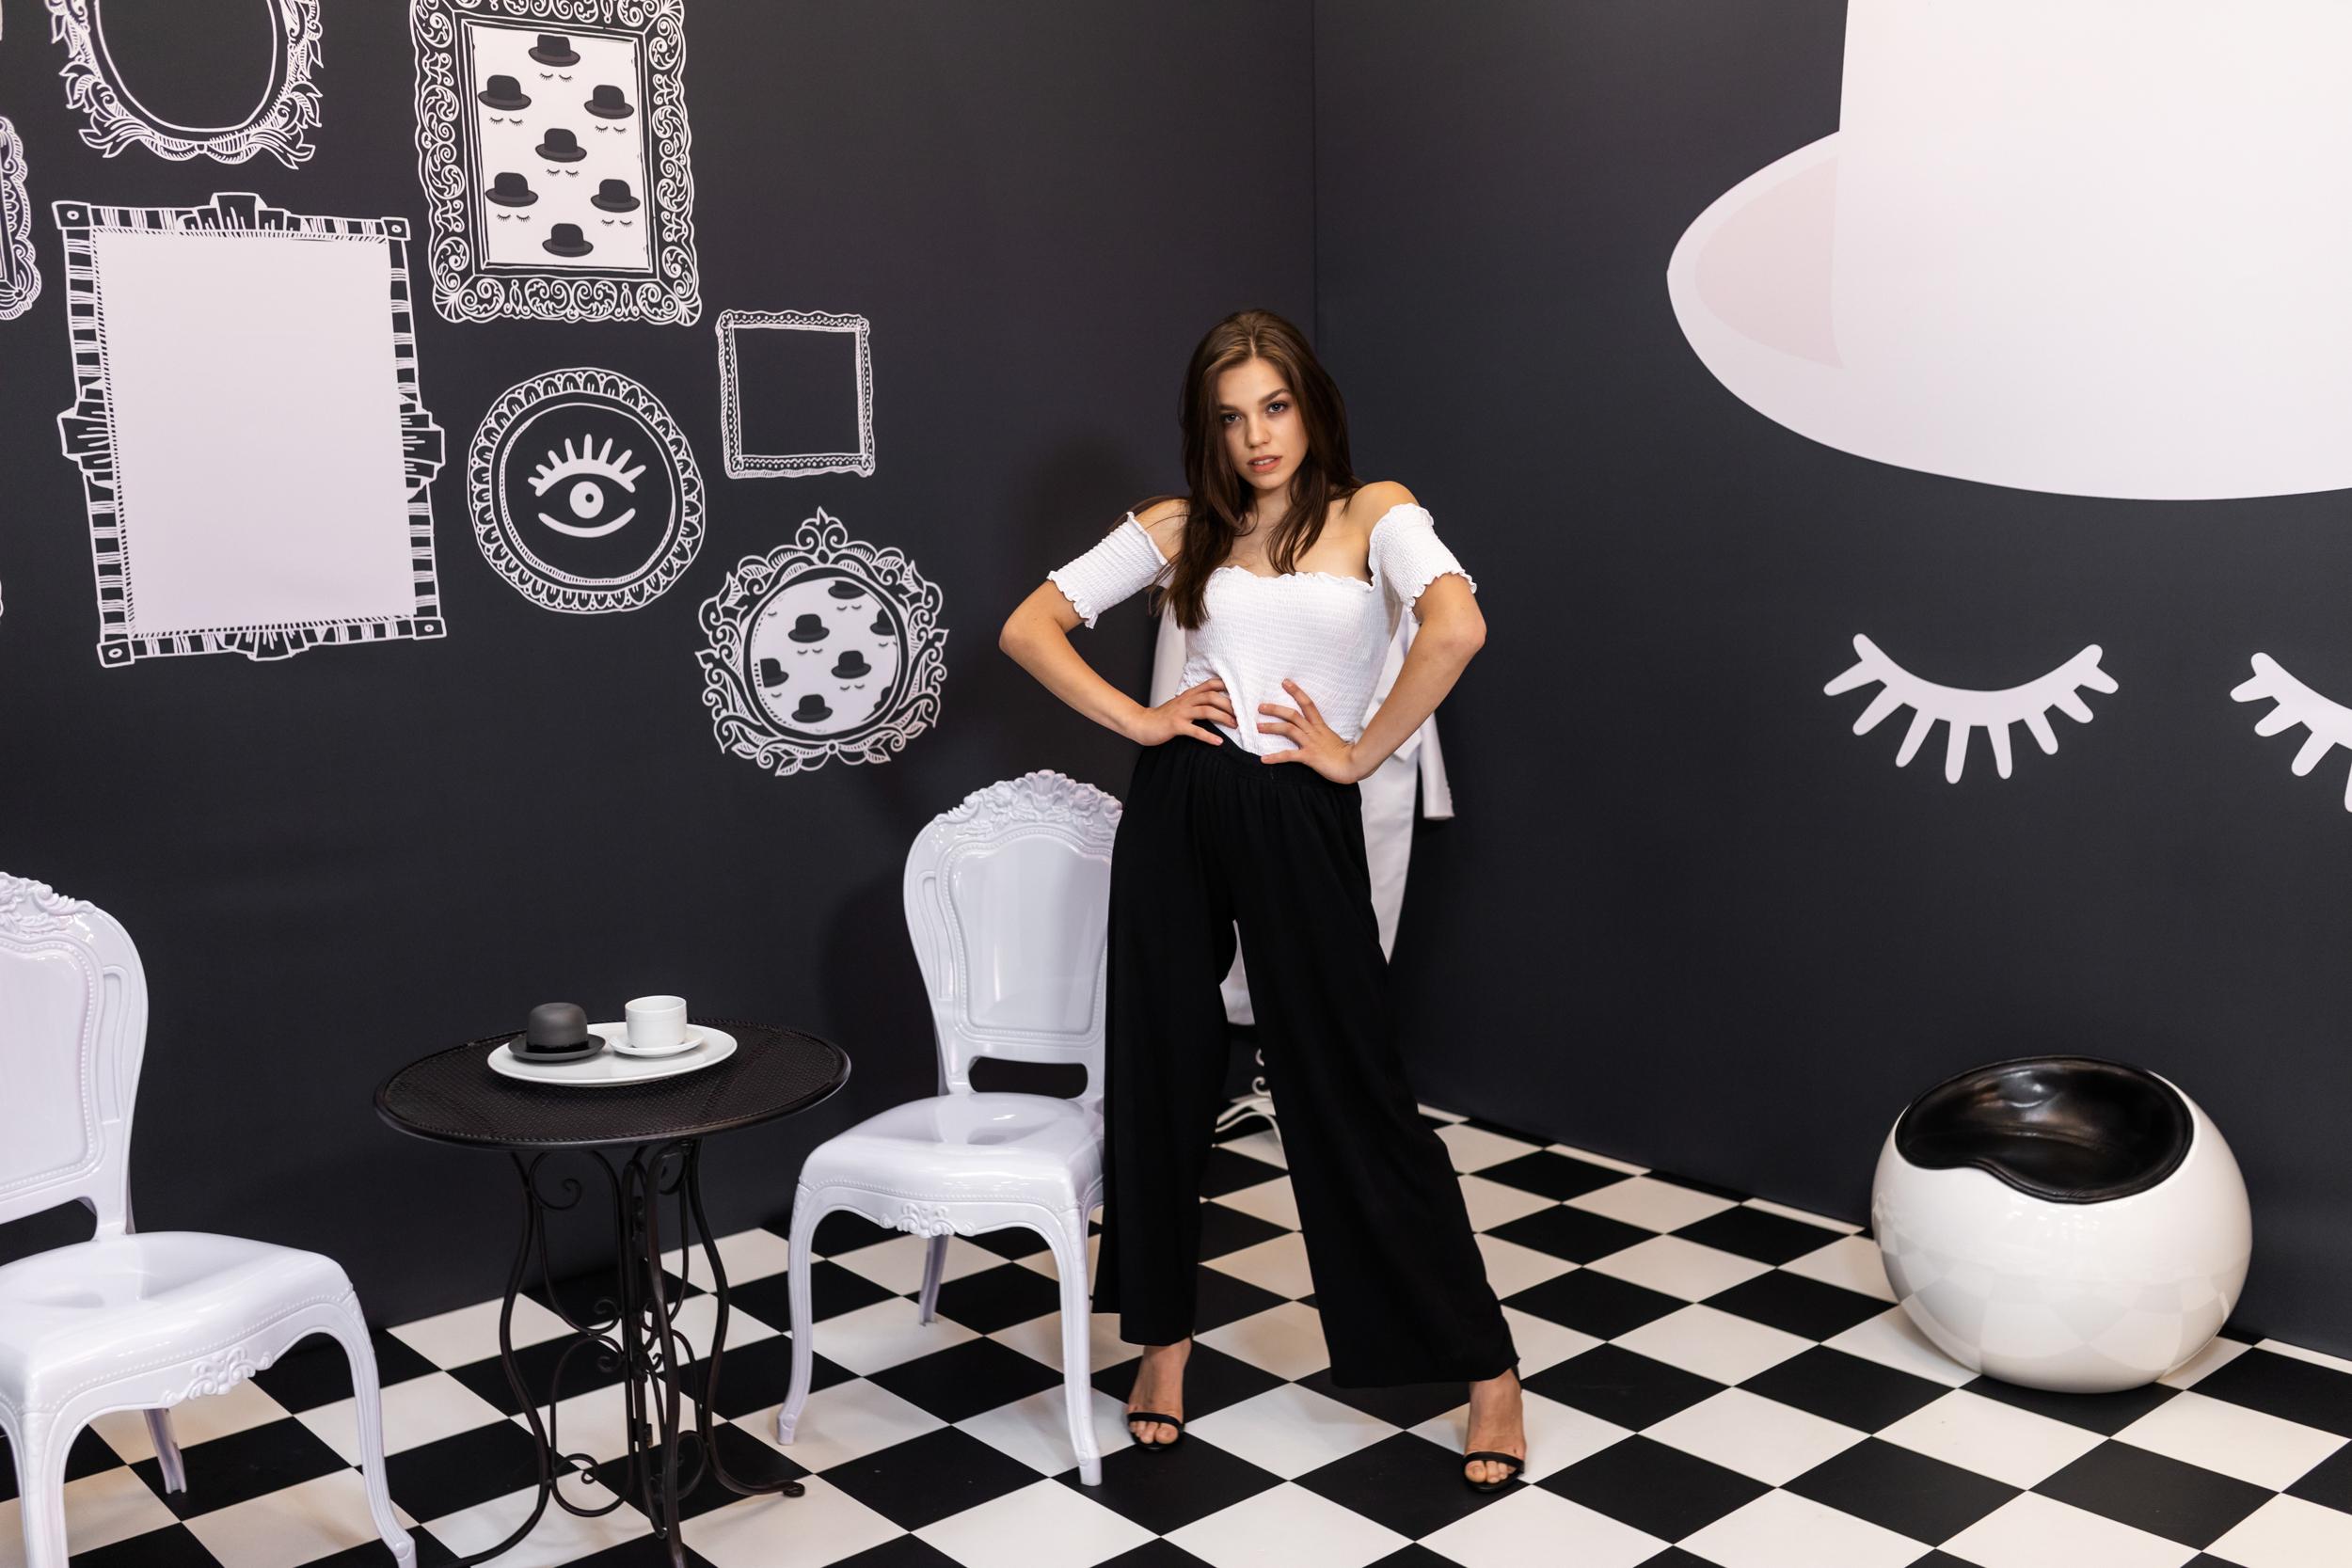 Black White Portfolio Konzept Art 5 1  Tee Zeit - Fotografie Konzept